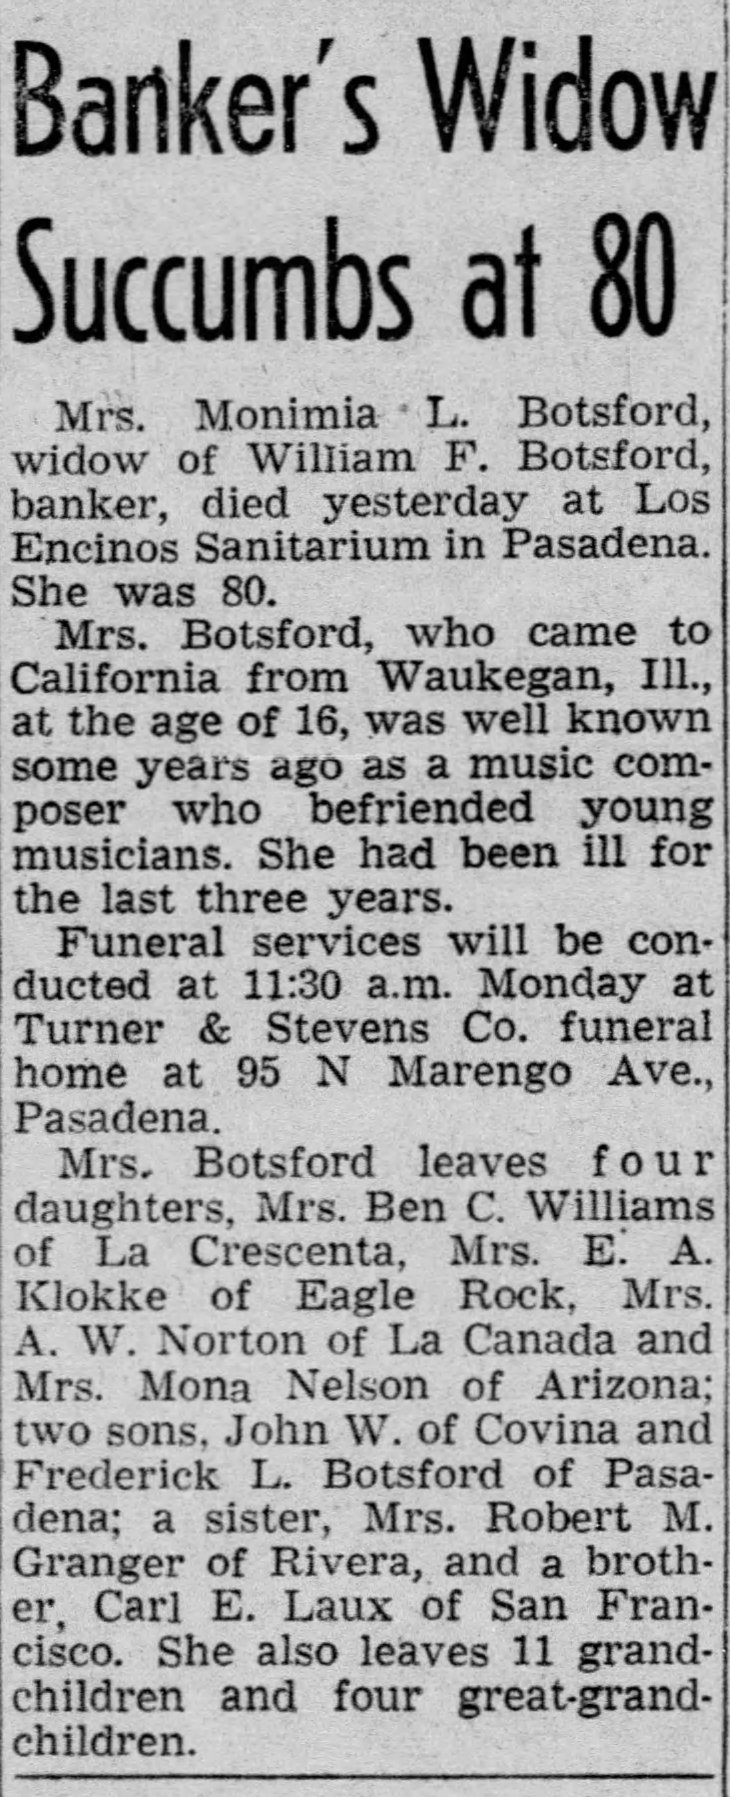 The_Los_Angeles_Times_Sat__Apr_17__1948_